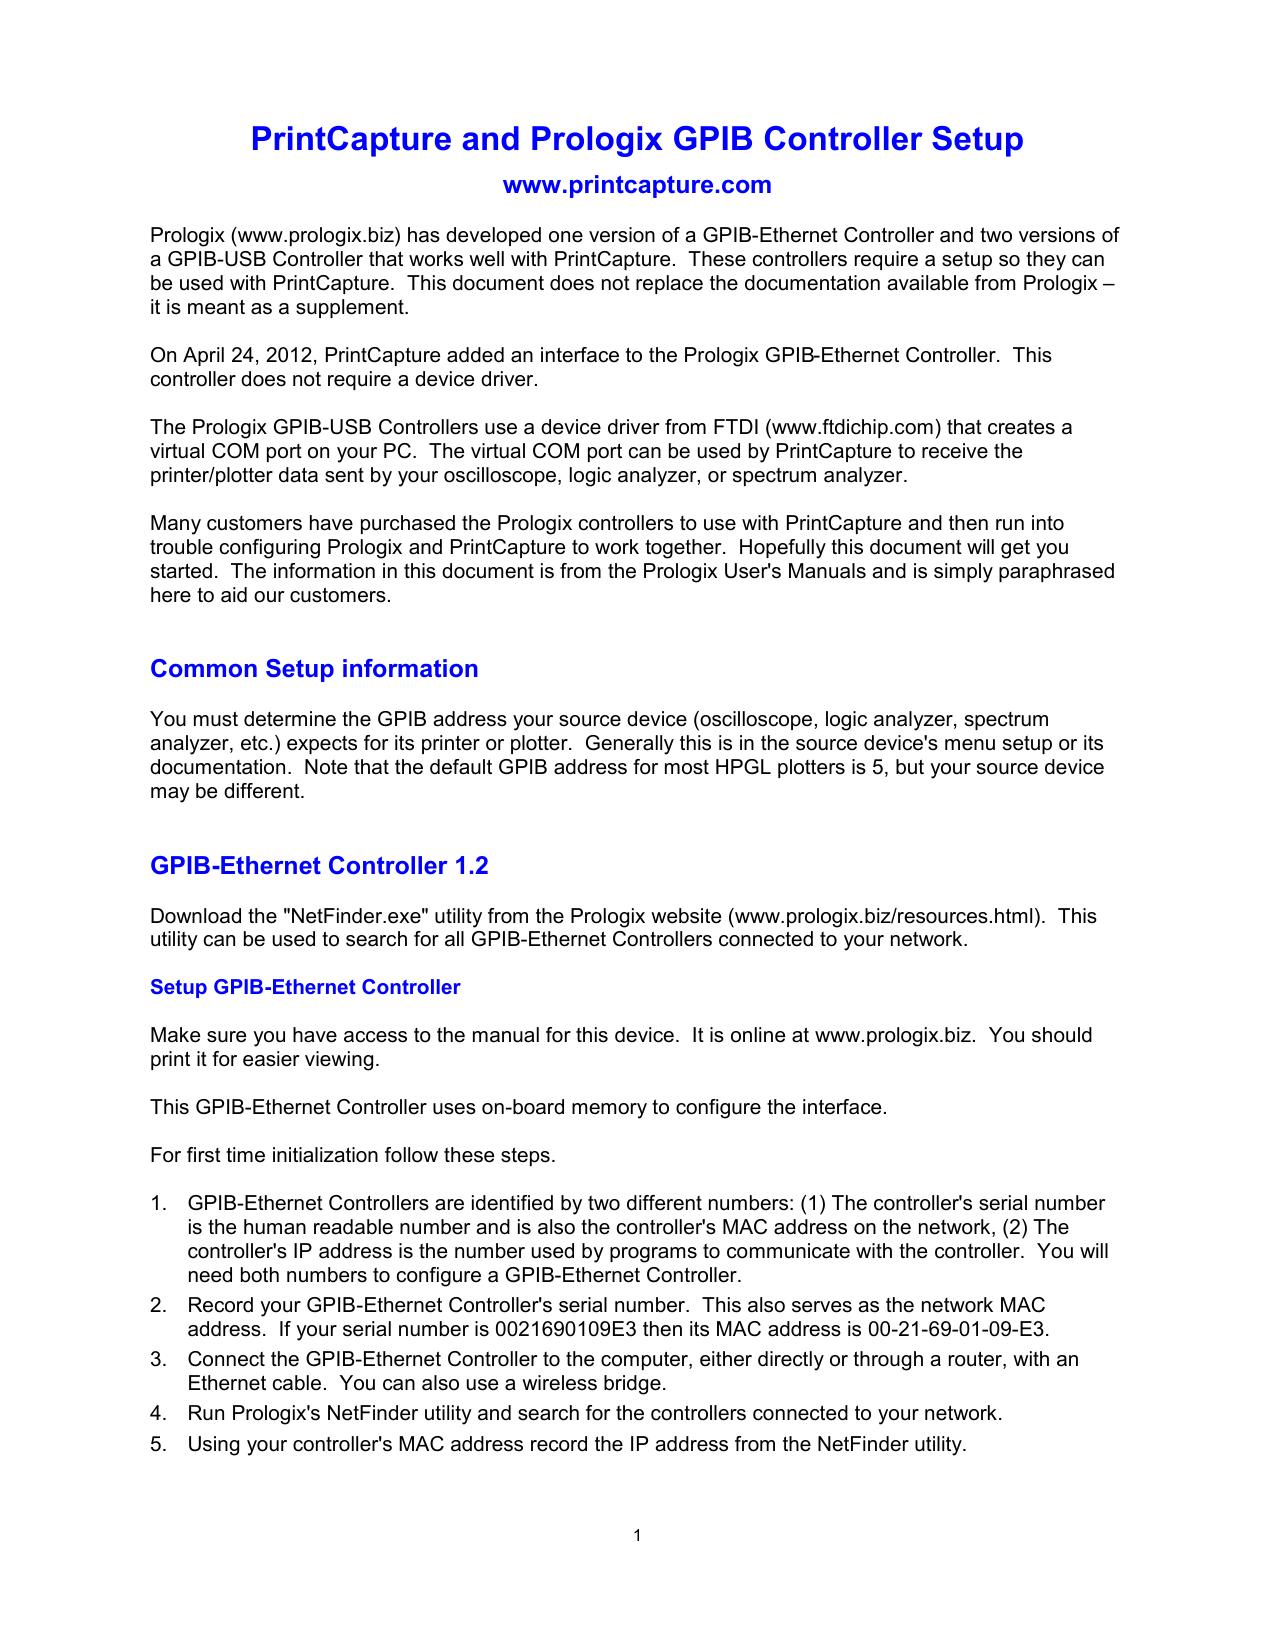 PrintCapture and Prologix GPIB Controller Setup | manualzz com